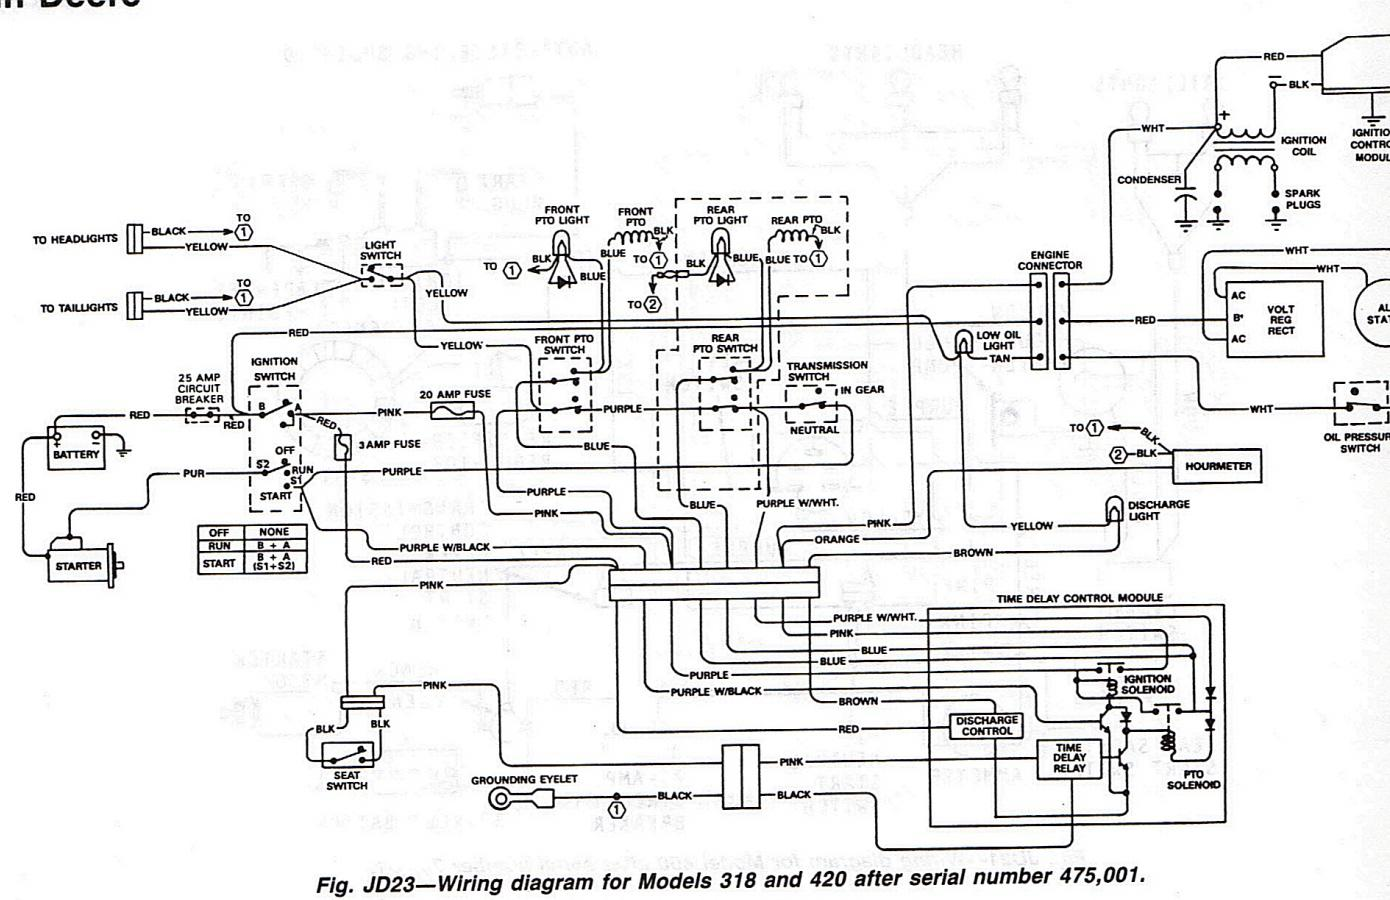 onan engine schematics wiring diagrams 02 ford explorer 4x4 fuse Onan Troubleshooting  Onan Coil Wiring Diagram Transfer Switch Wiring Diagram Onan Transfer Switch Diagram